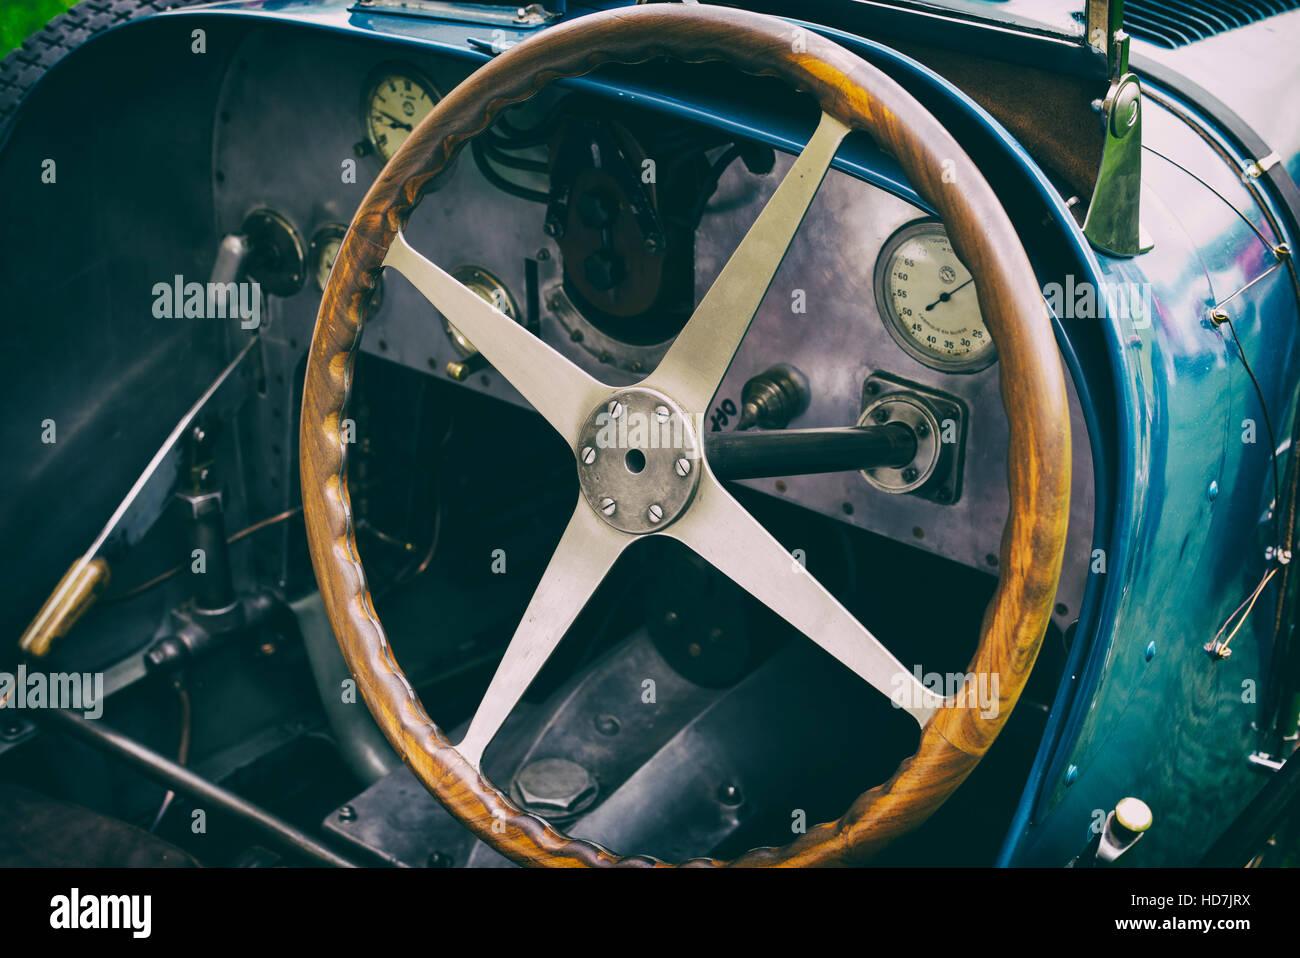 Oldtimer Bugatti Typ 35 b Racing Car Interieur. VEREINIGTES ...